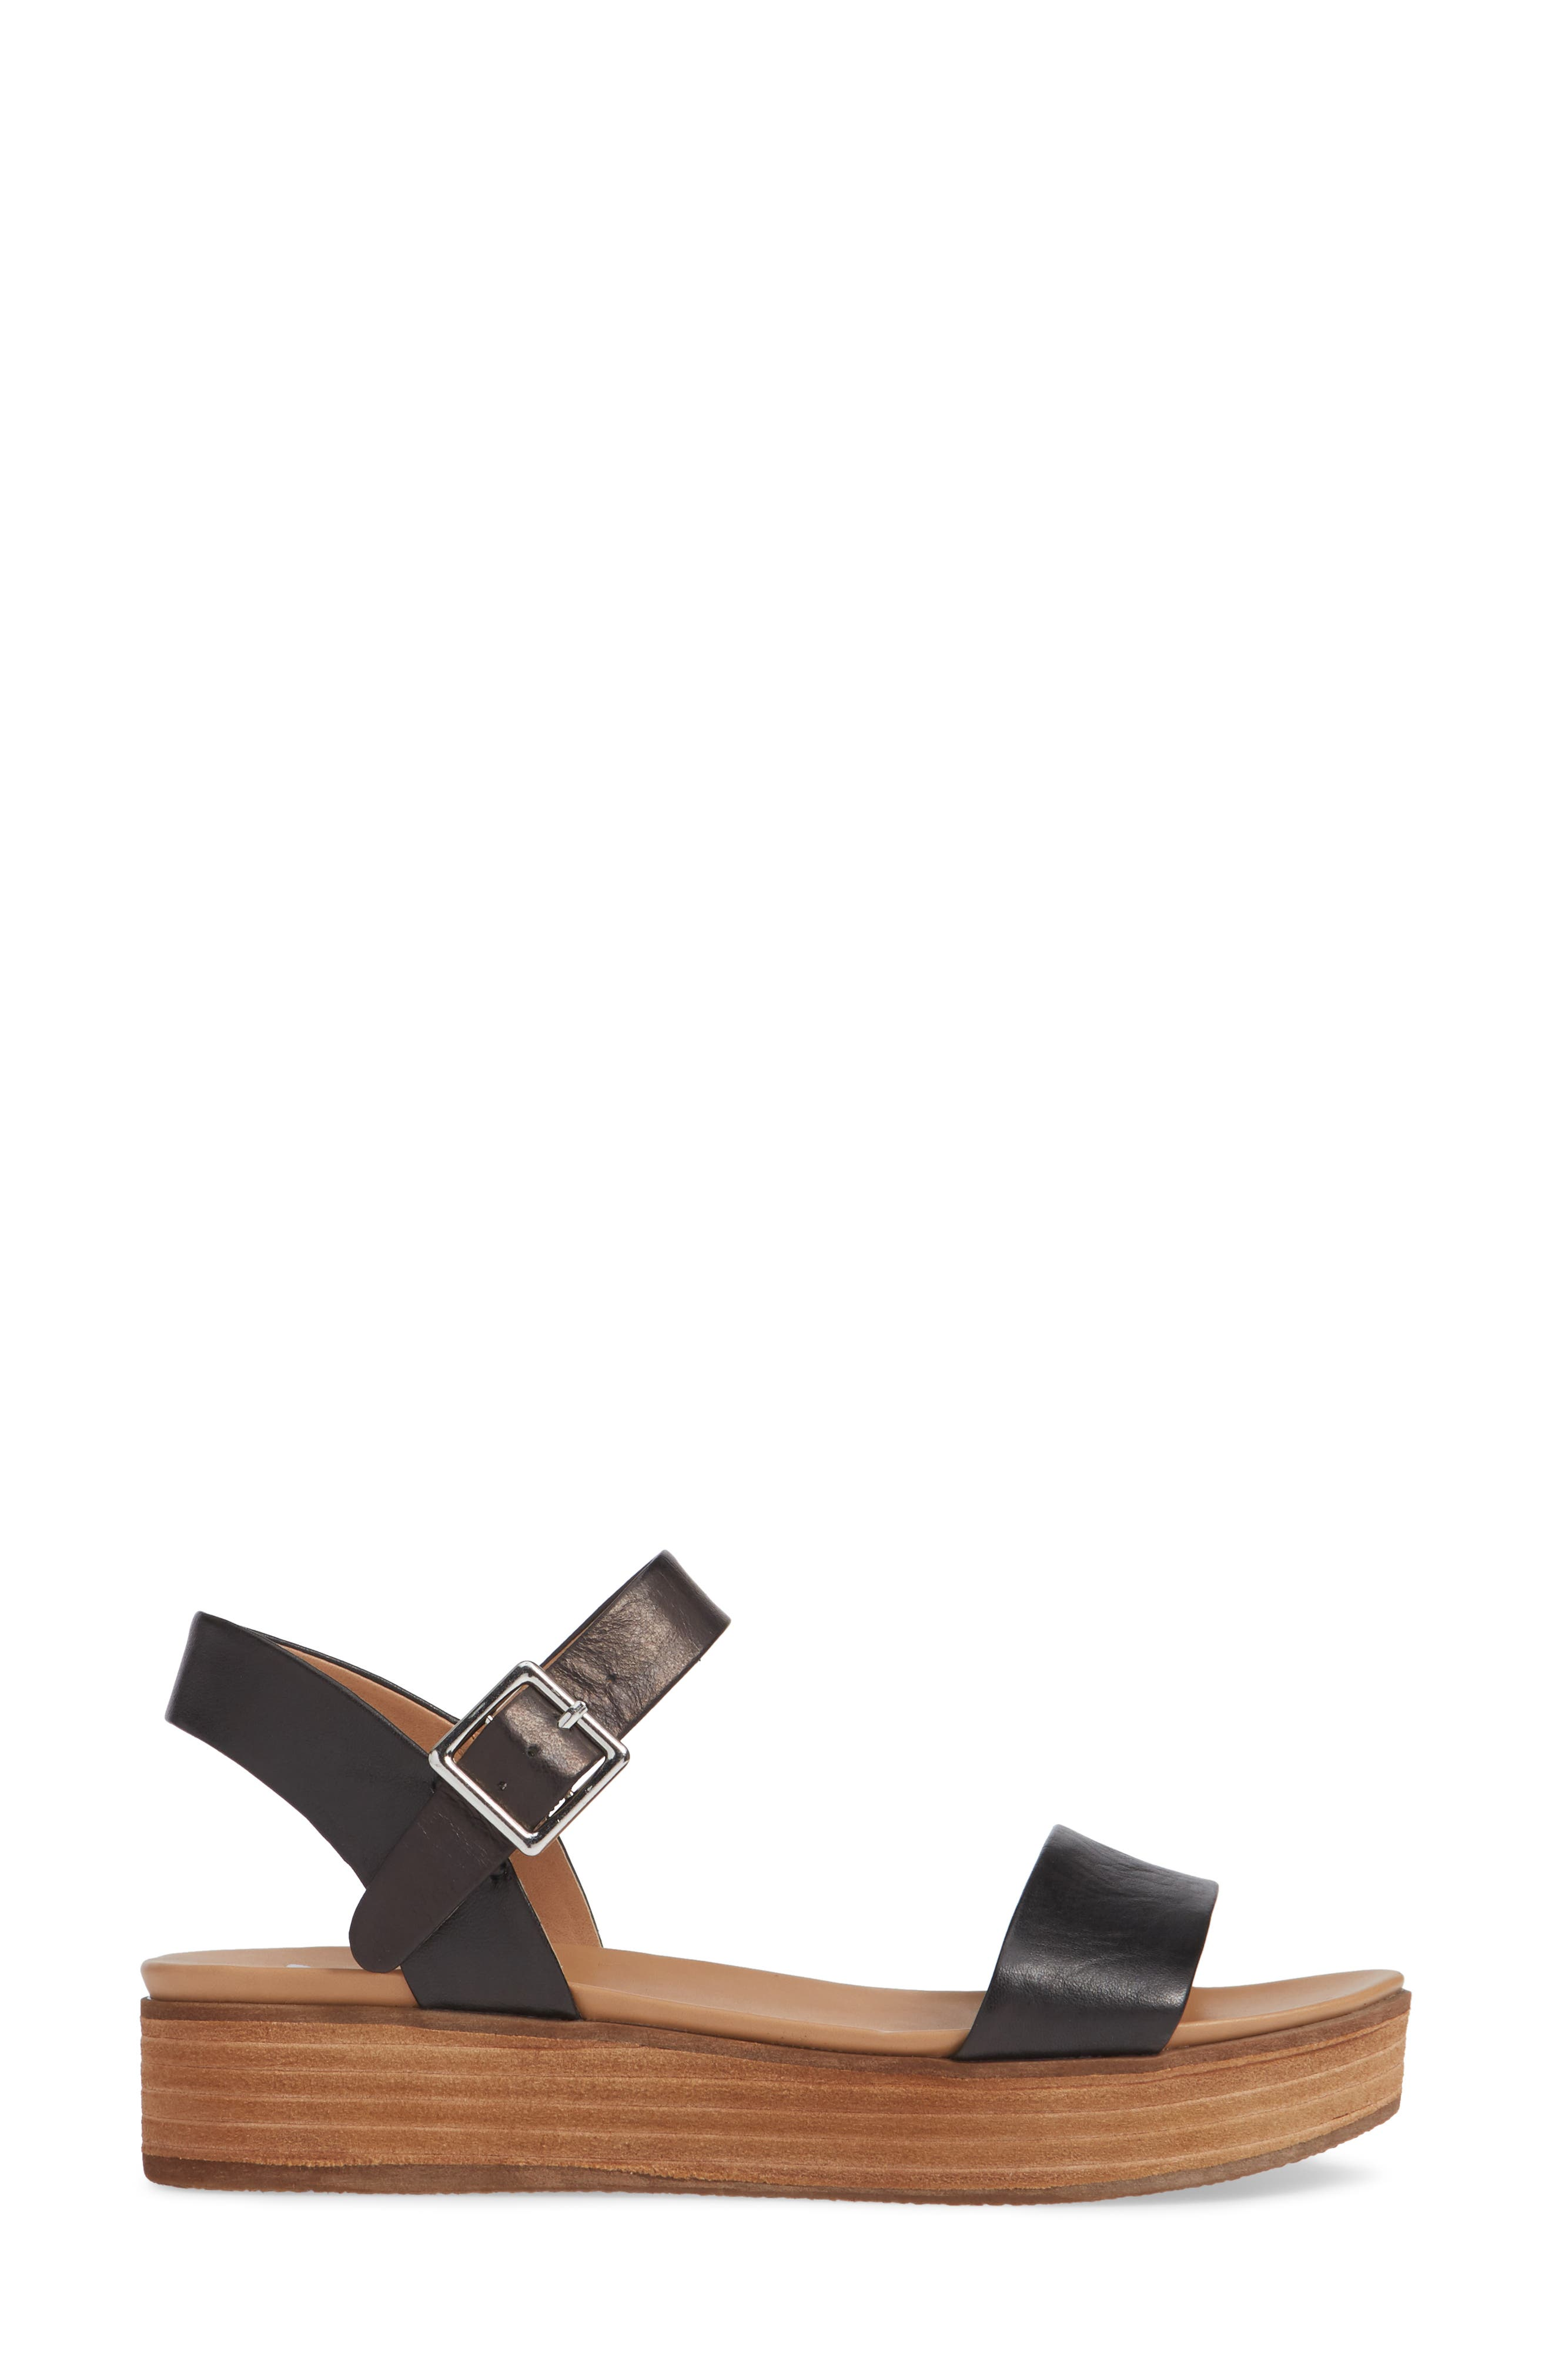 STEVE MADDEN, Aida Platform Sandal, Alternate thumbnail 3, color, BLACK LEATHER